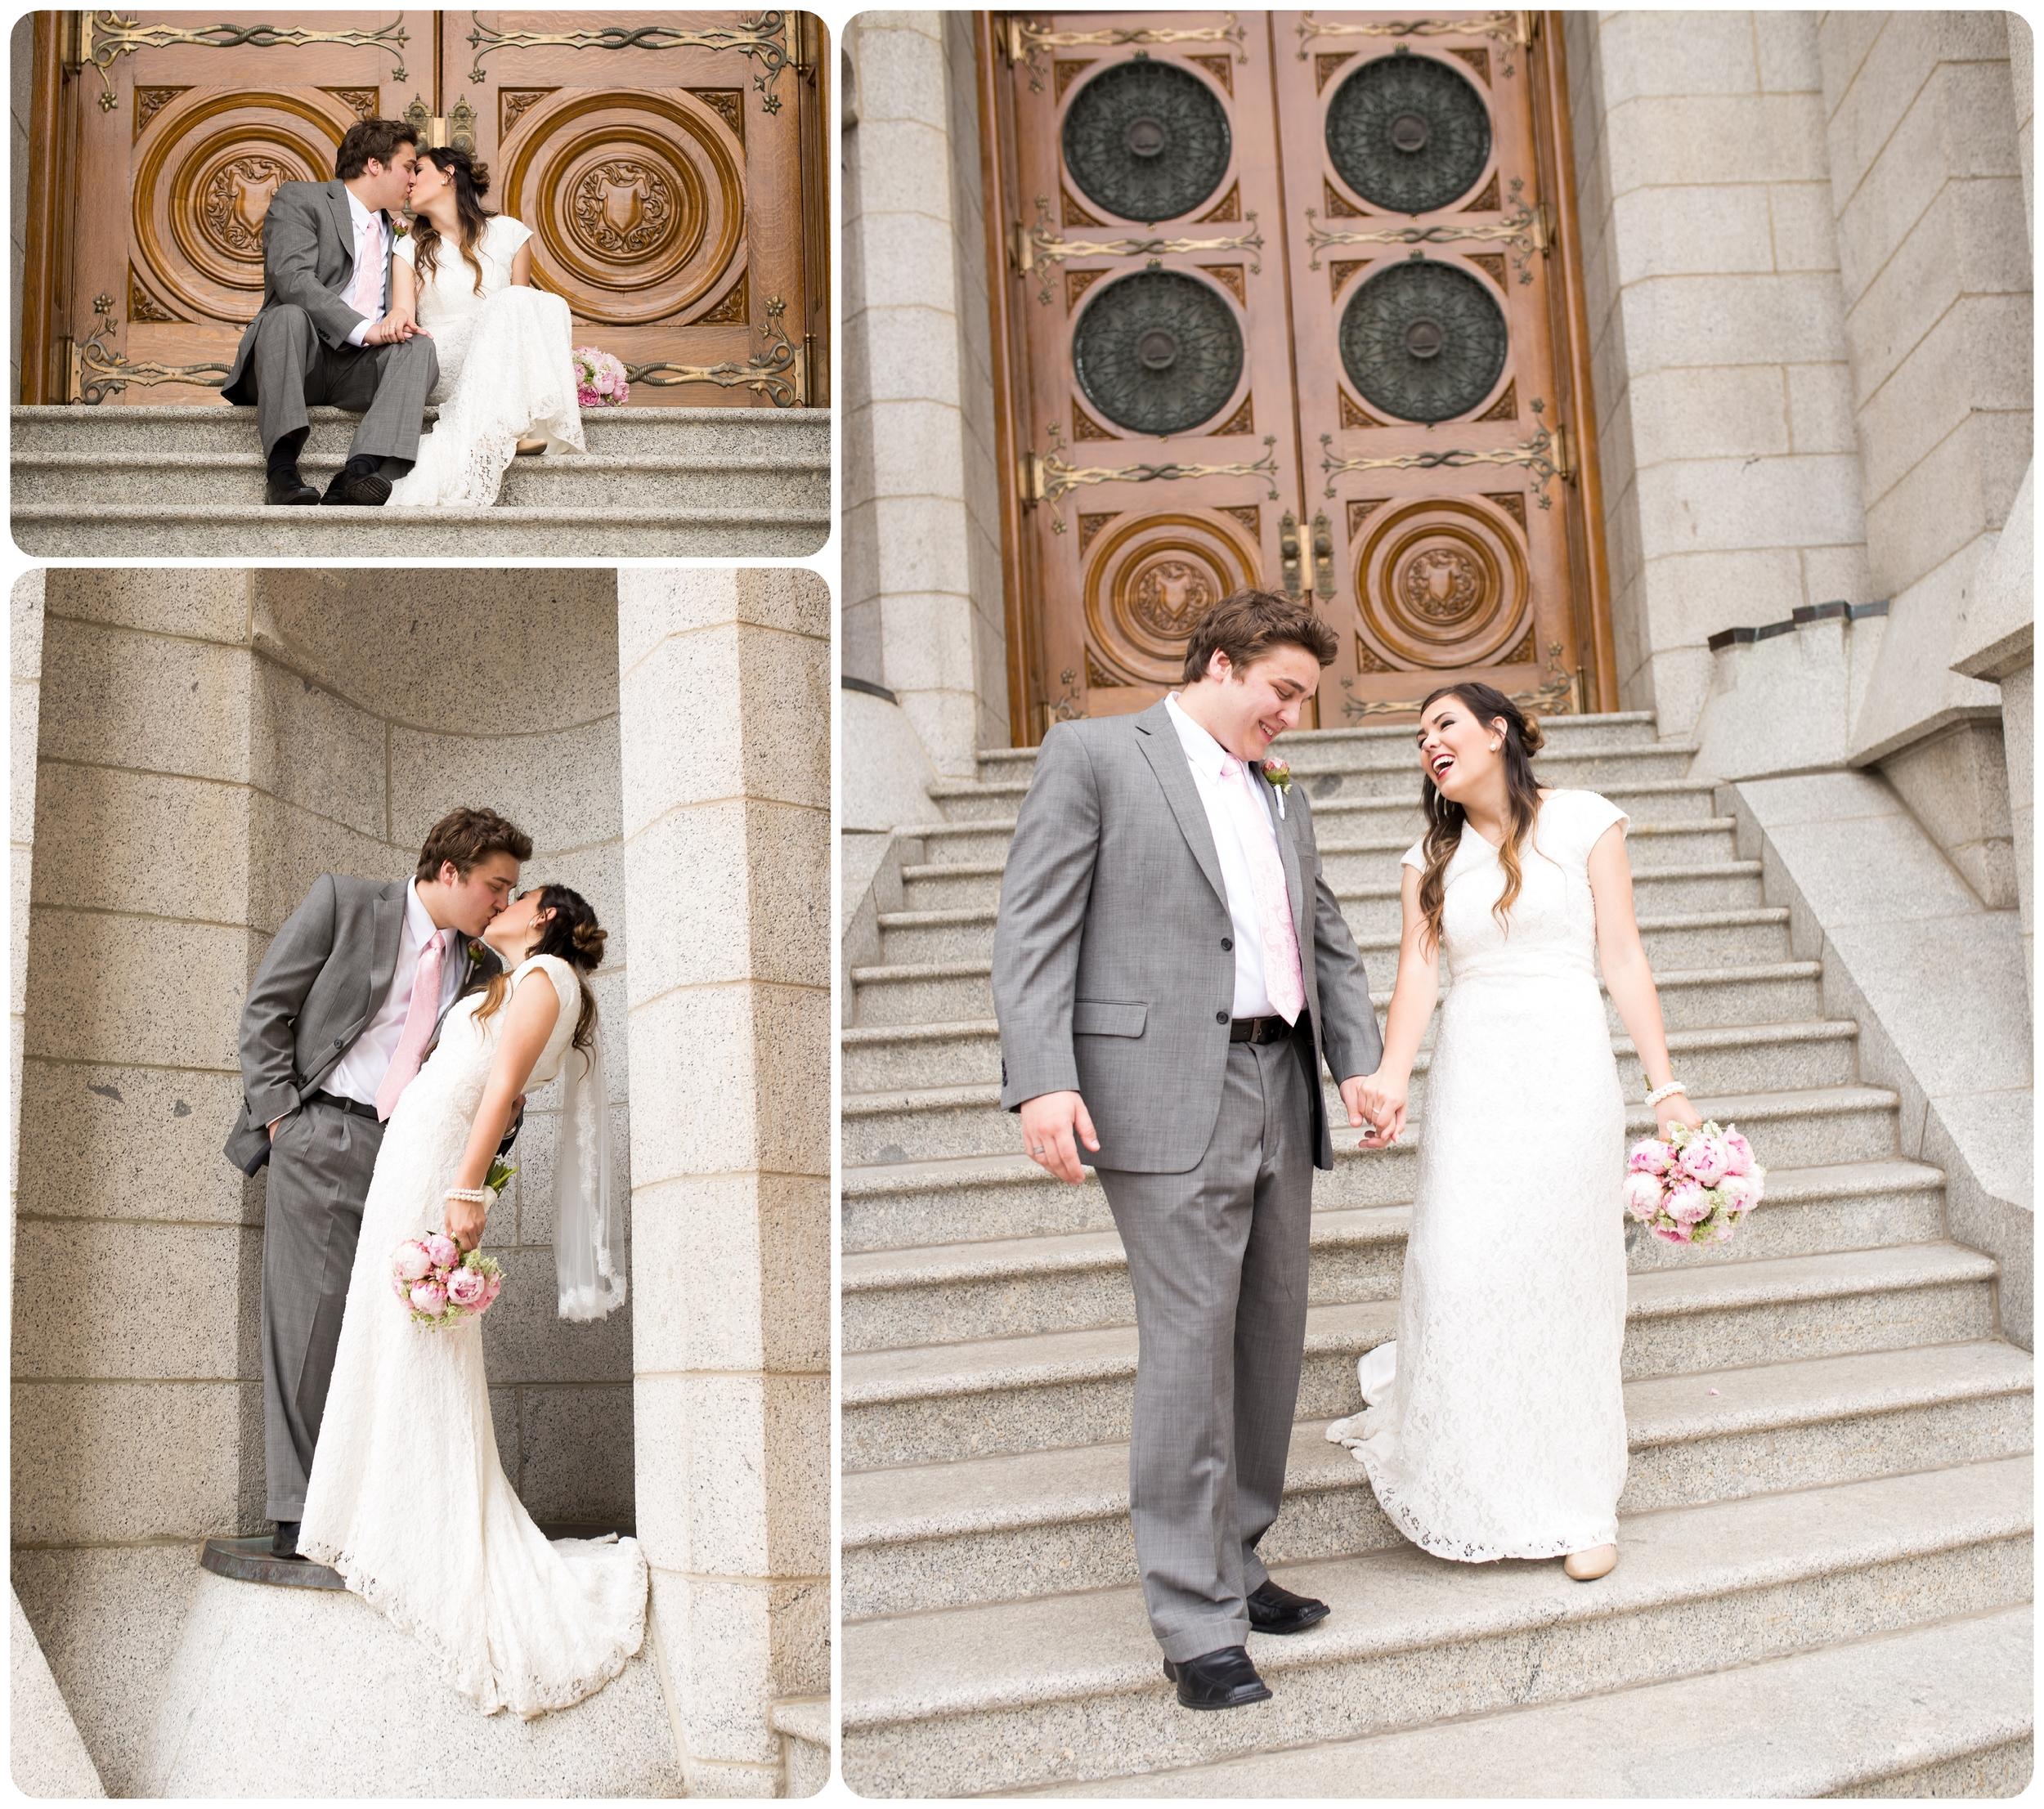 Rachel Lindsey Photography | Salt Lake City, UT | Engagements & Wedding Photographer | Salt Lake City Temple